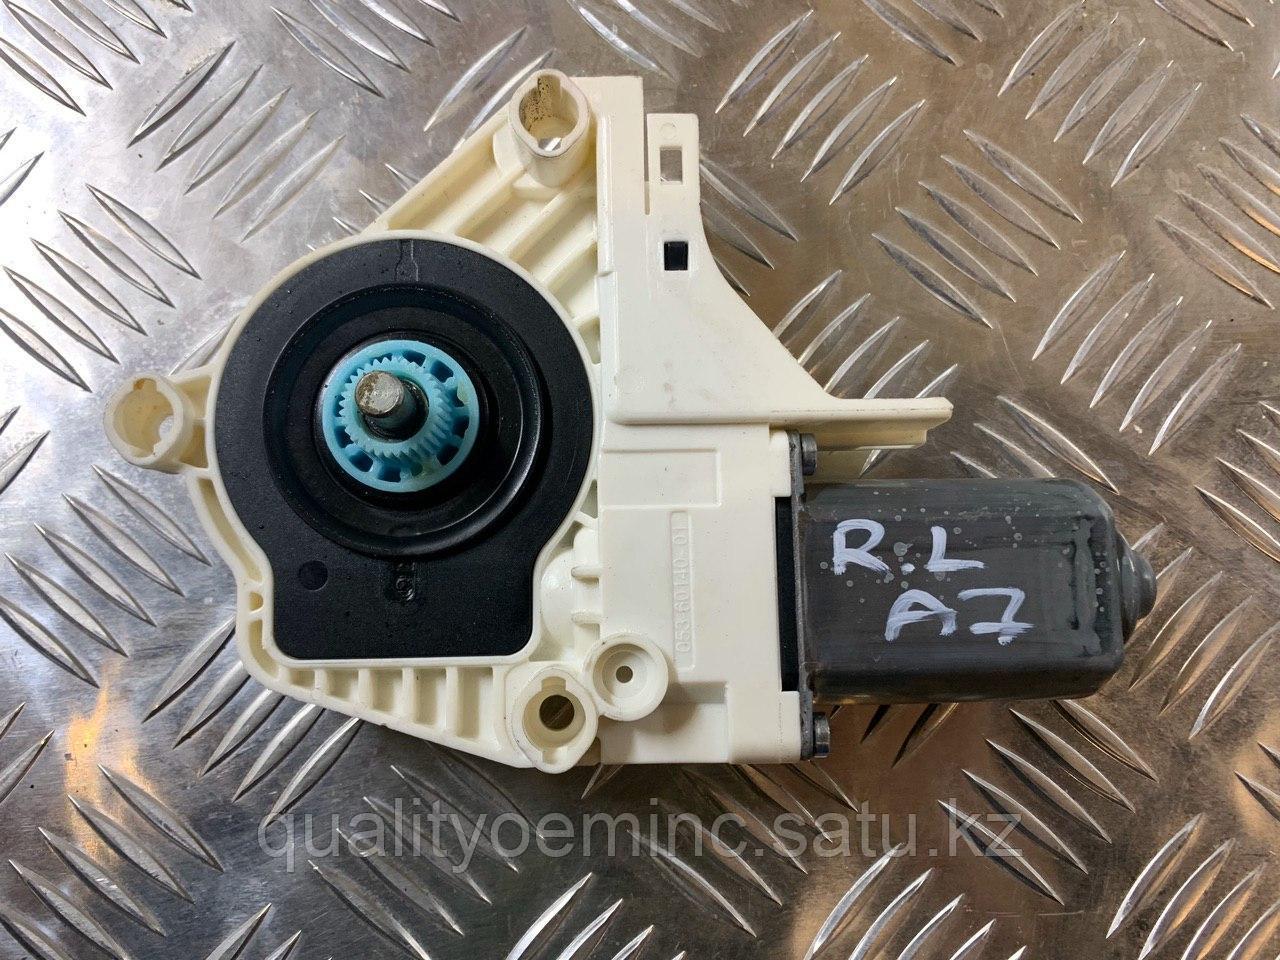 Моторчик стеклоподъемника задний левый на Audi A7 4G